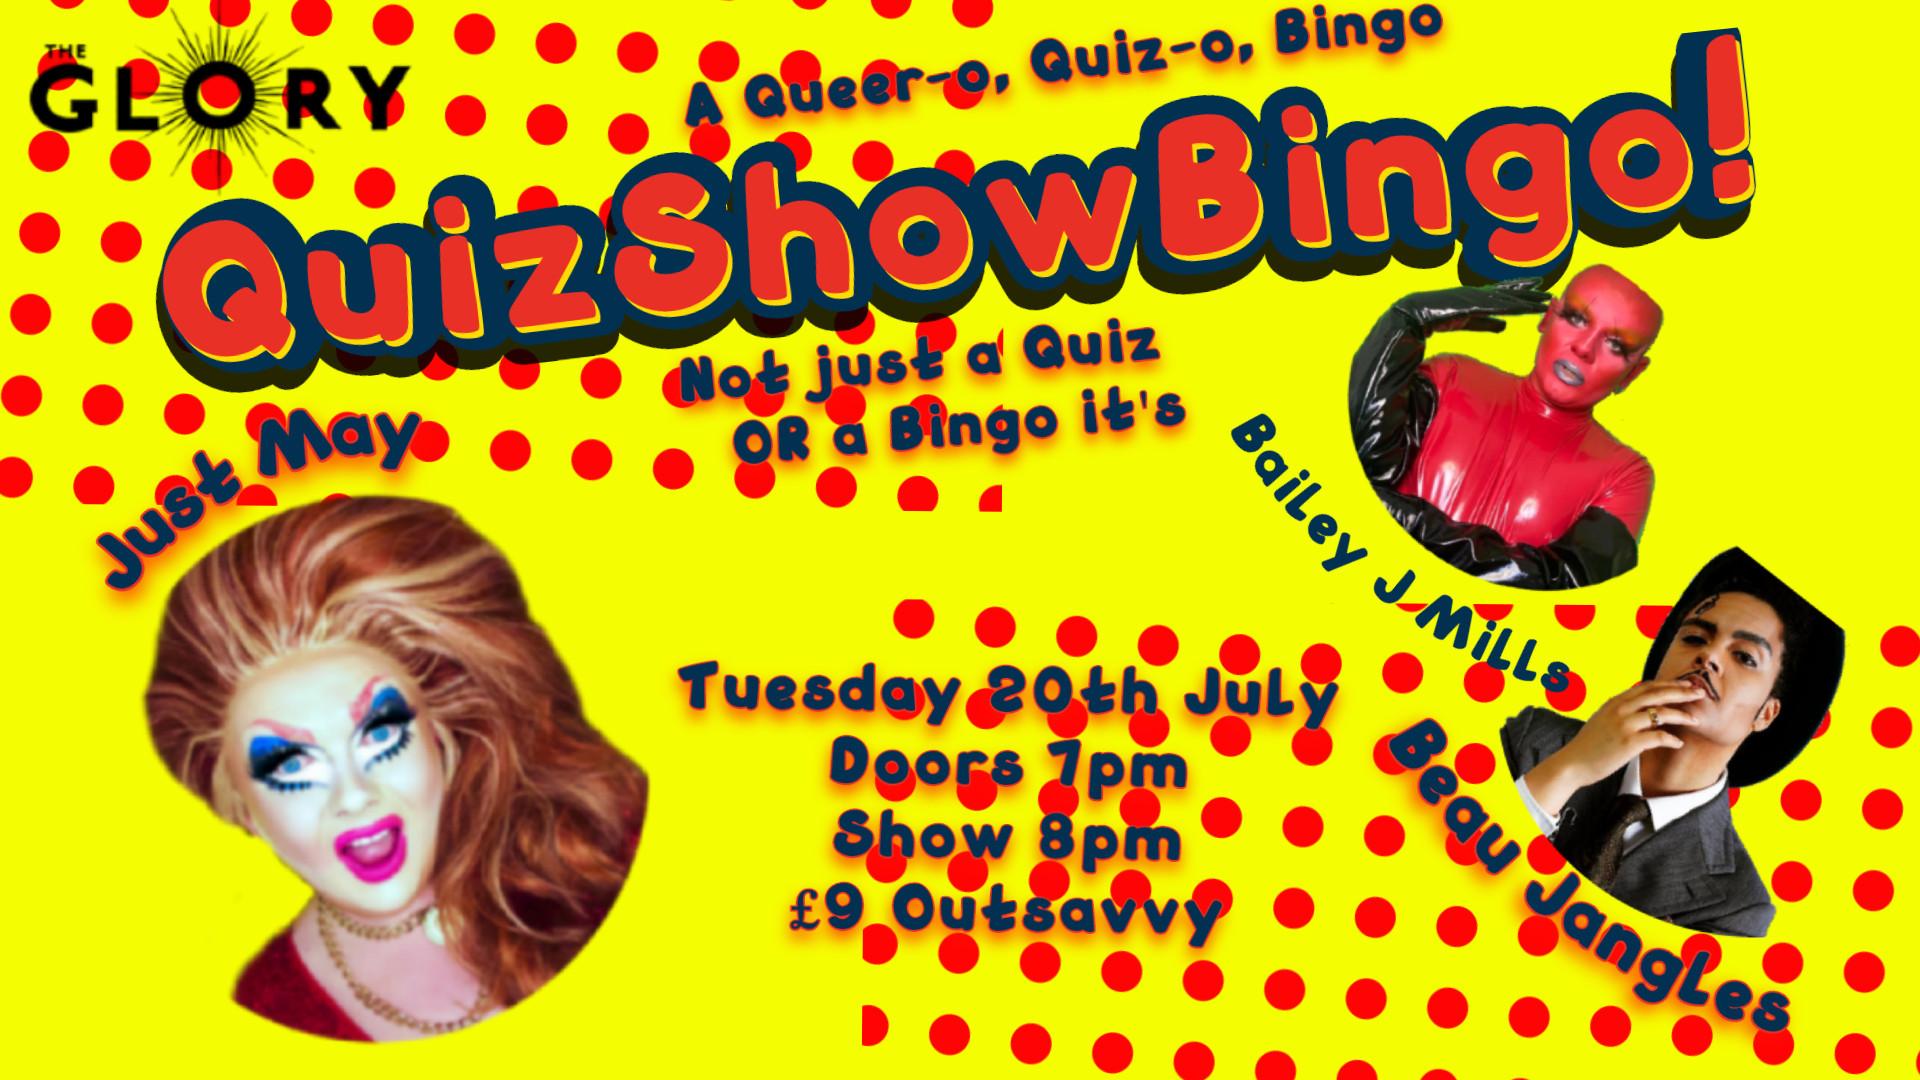 QuizShowBingo with Bailey J Mills & Beau Jangles